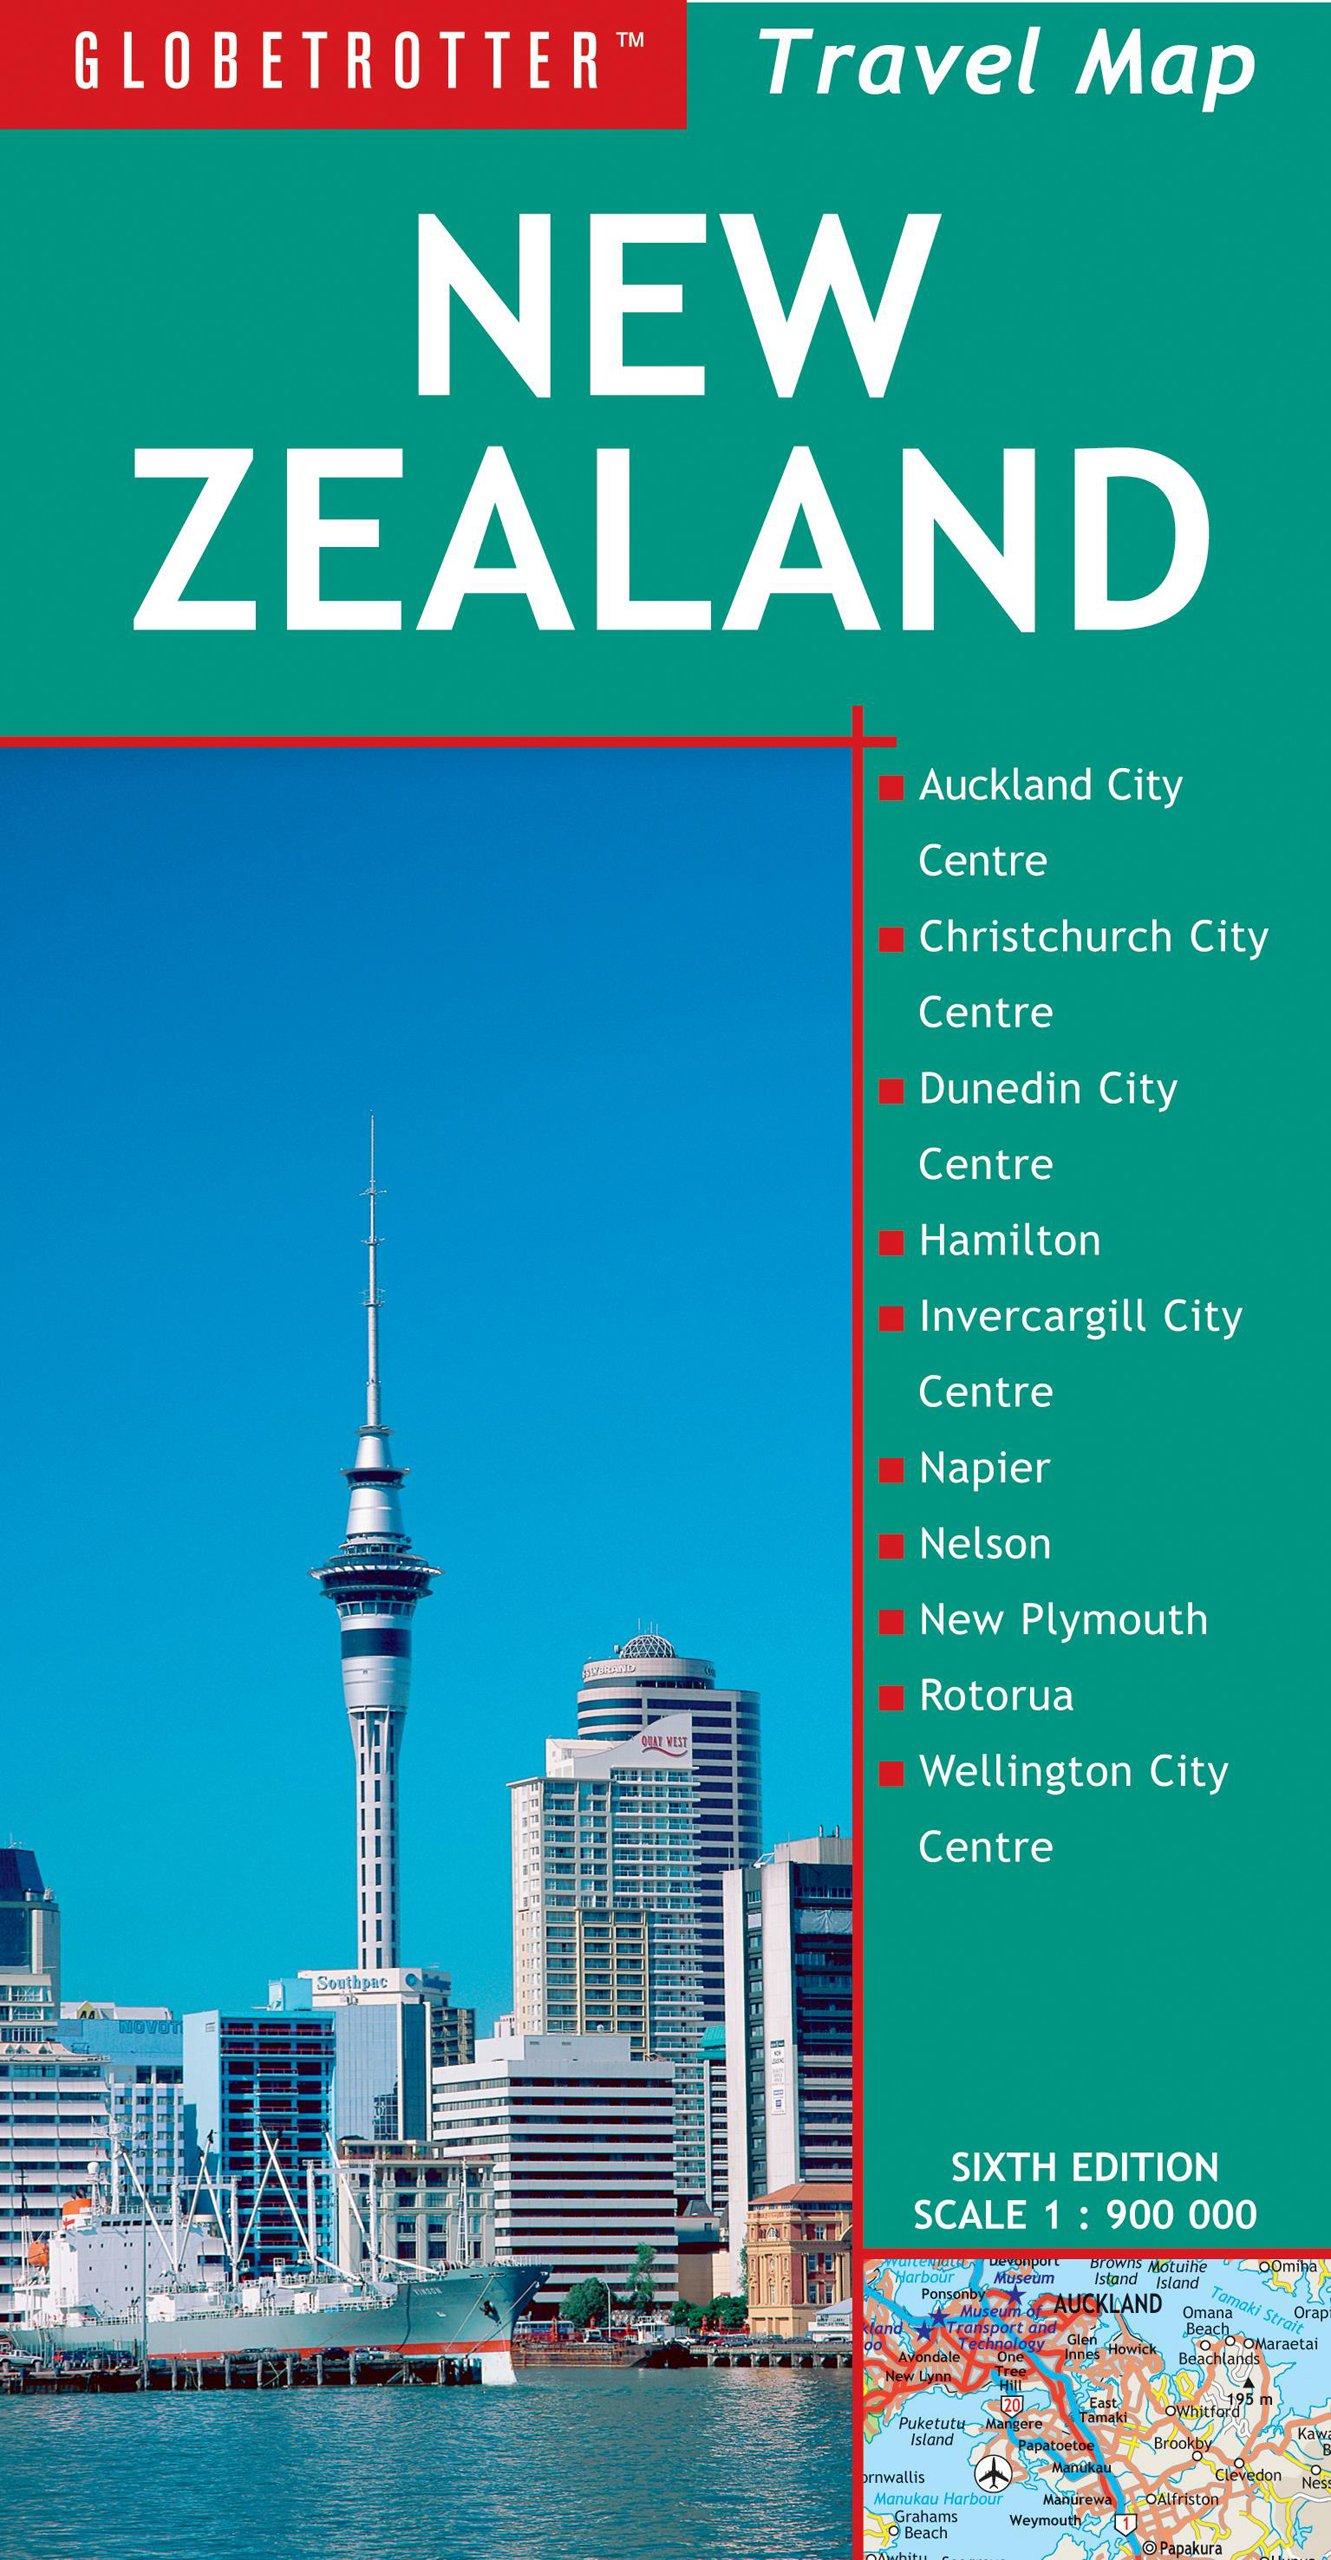 Travel Map New Zealand (Globetrotter Travel Map)